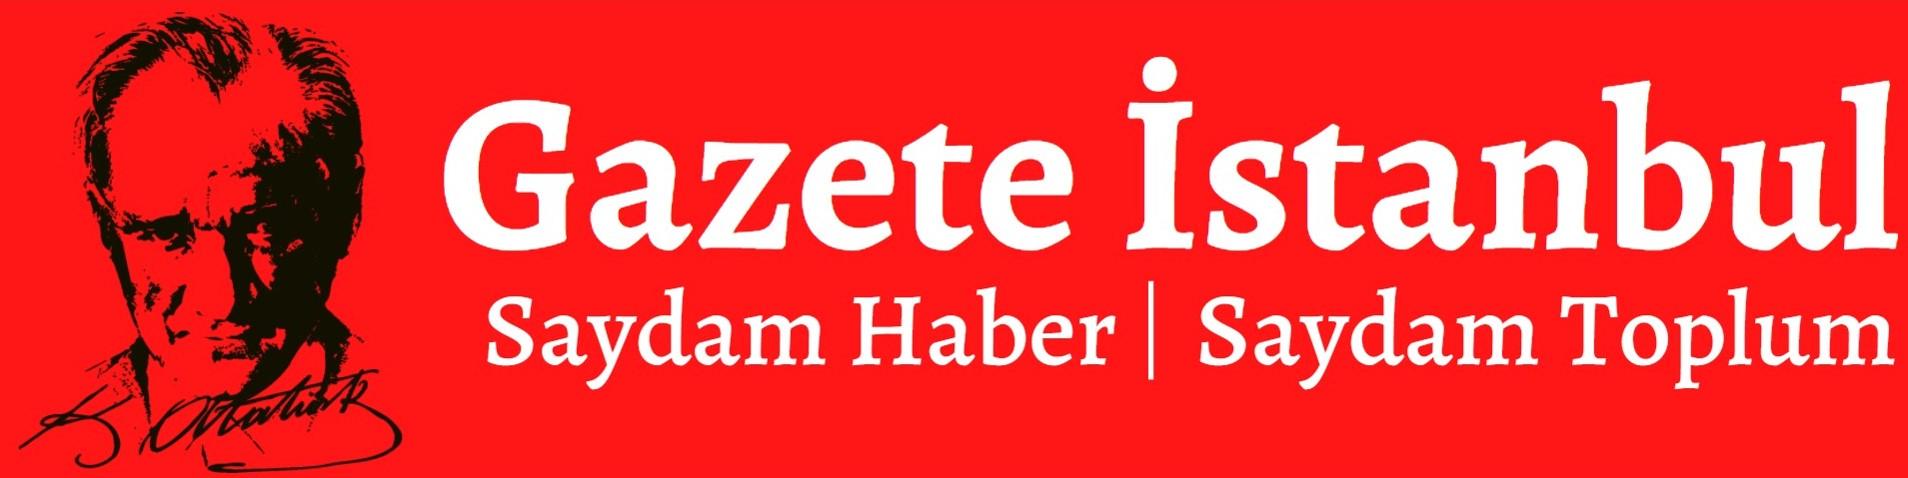 Gazete İstanbul Logo